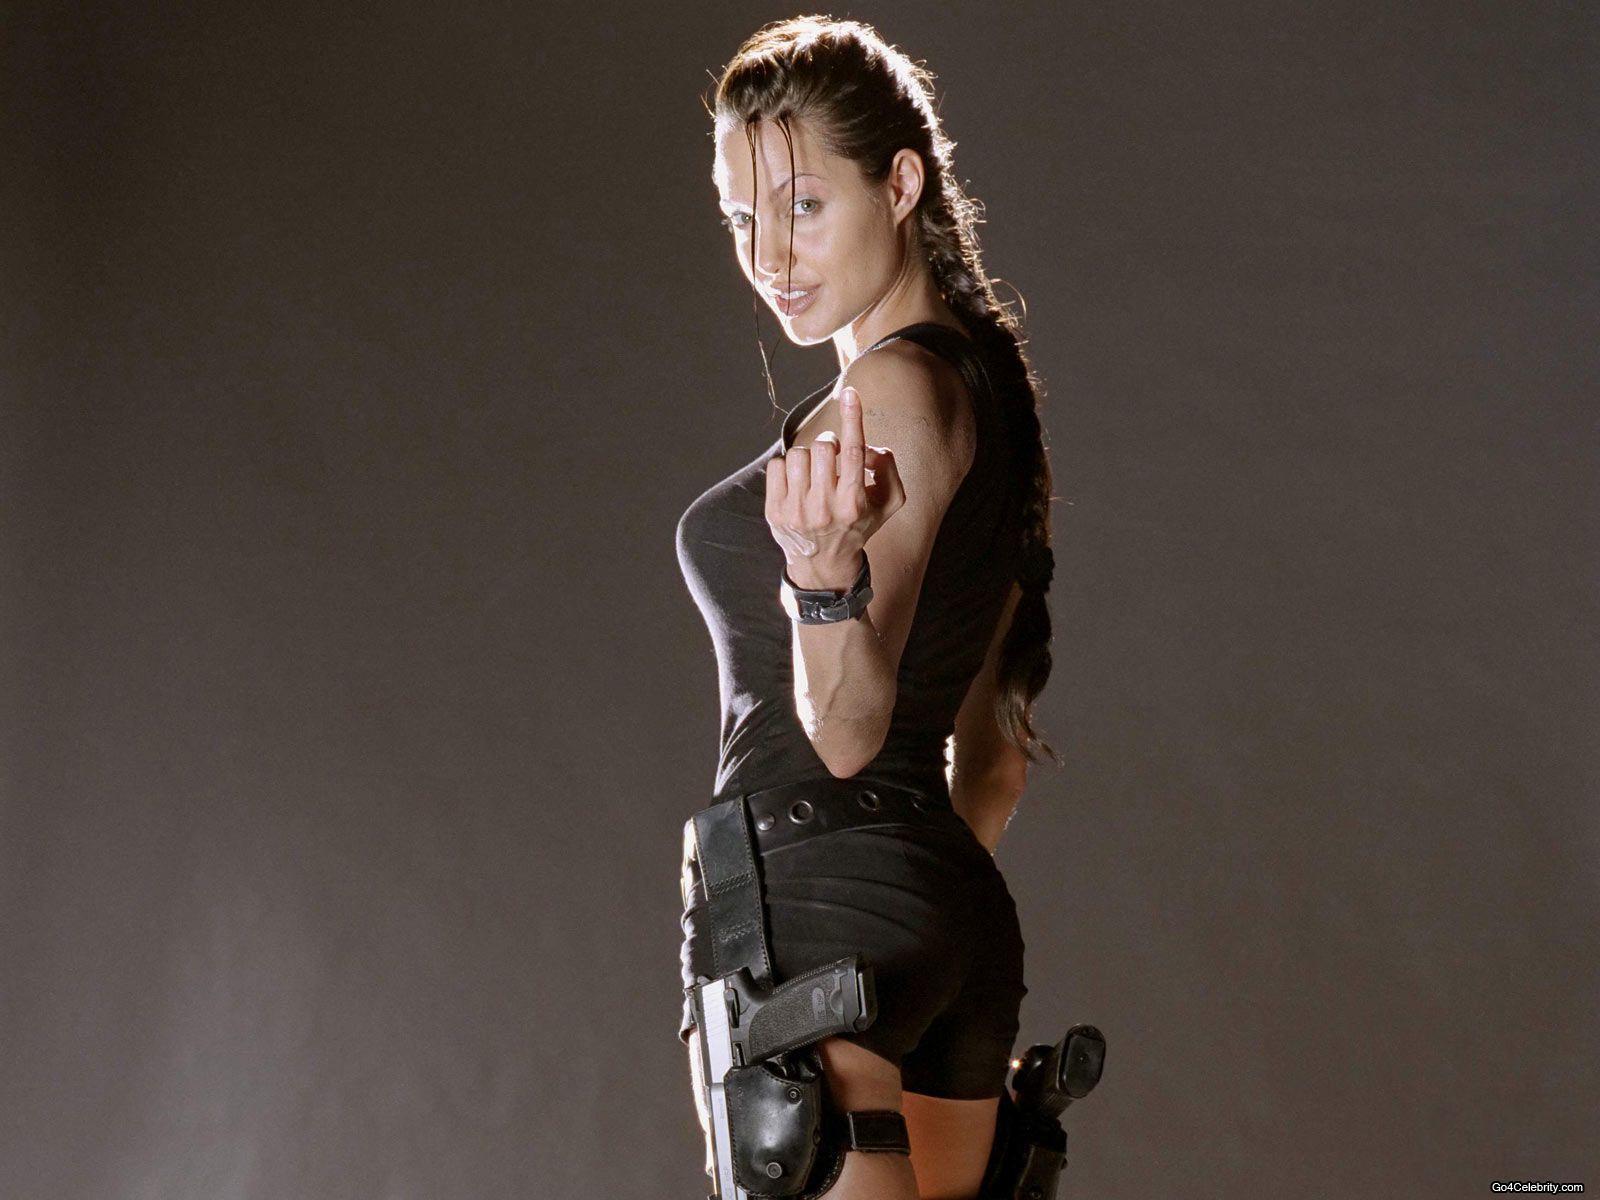 Angelina Jolie Sex sexy images - angelina jolie wallpaper (2701360) - fanpop